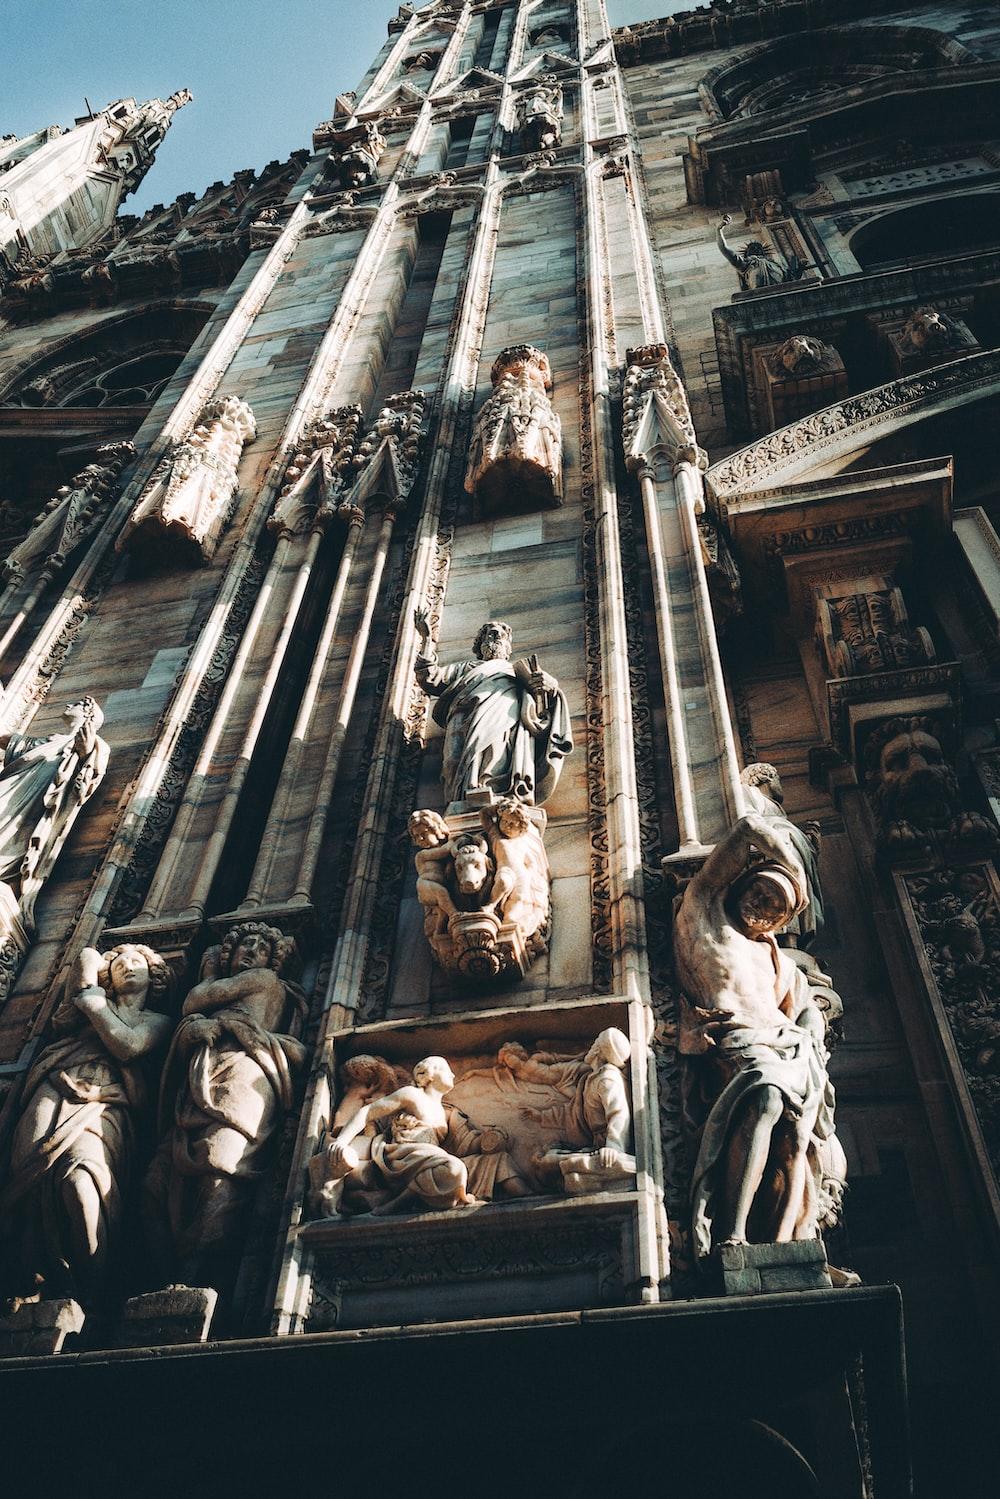 grayscale photo of concrete statues